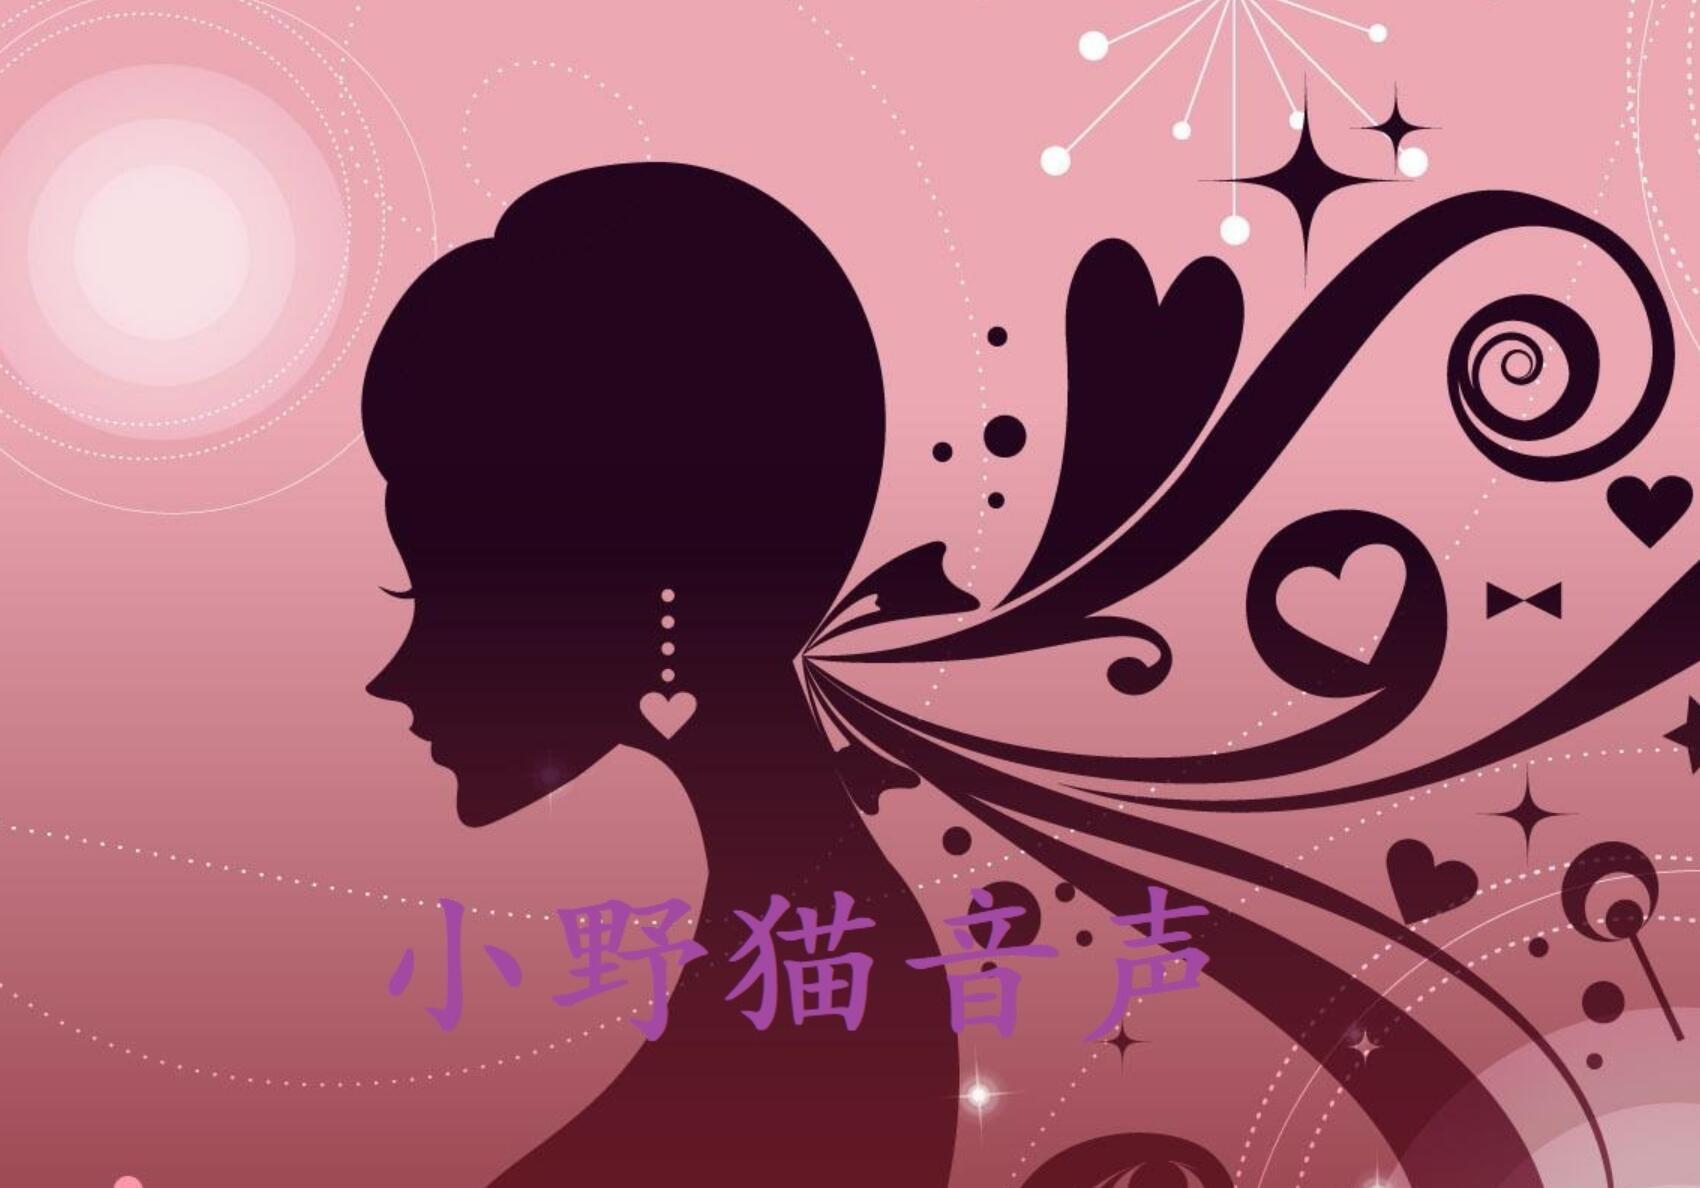 RJ329481 小野猫音声 夏日迷糊妈妈  CV青梅 [20210531]